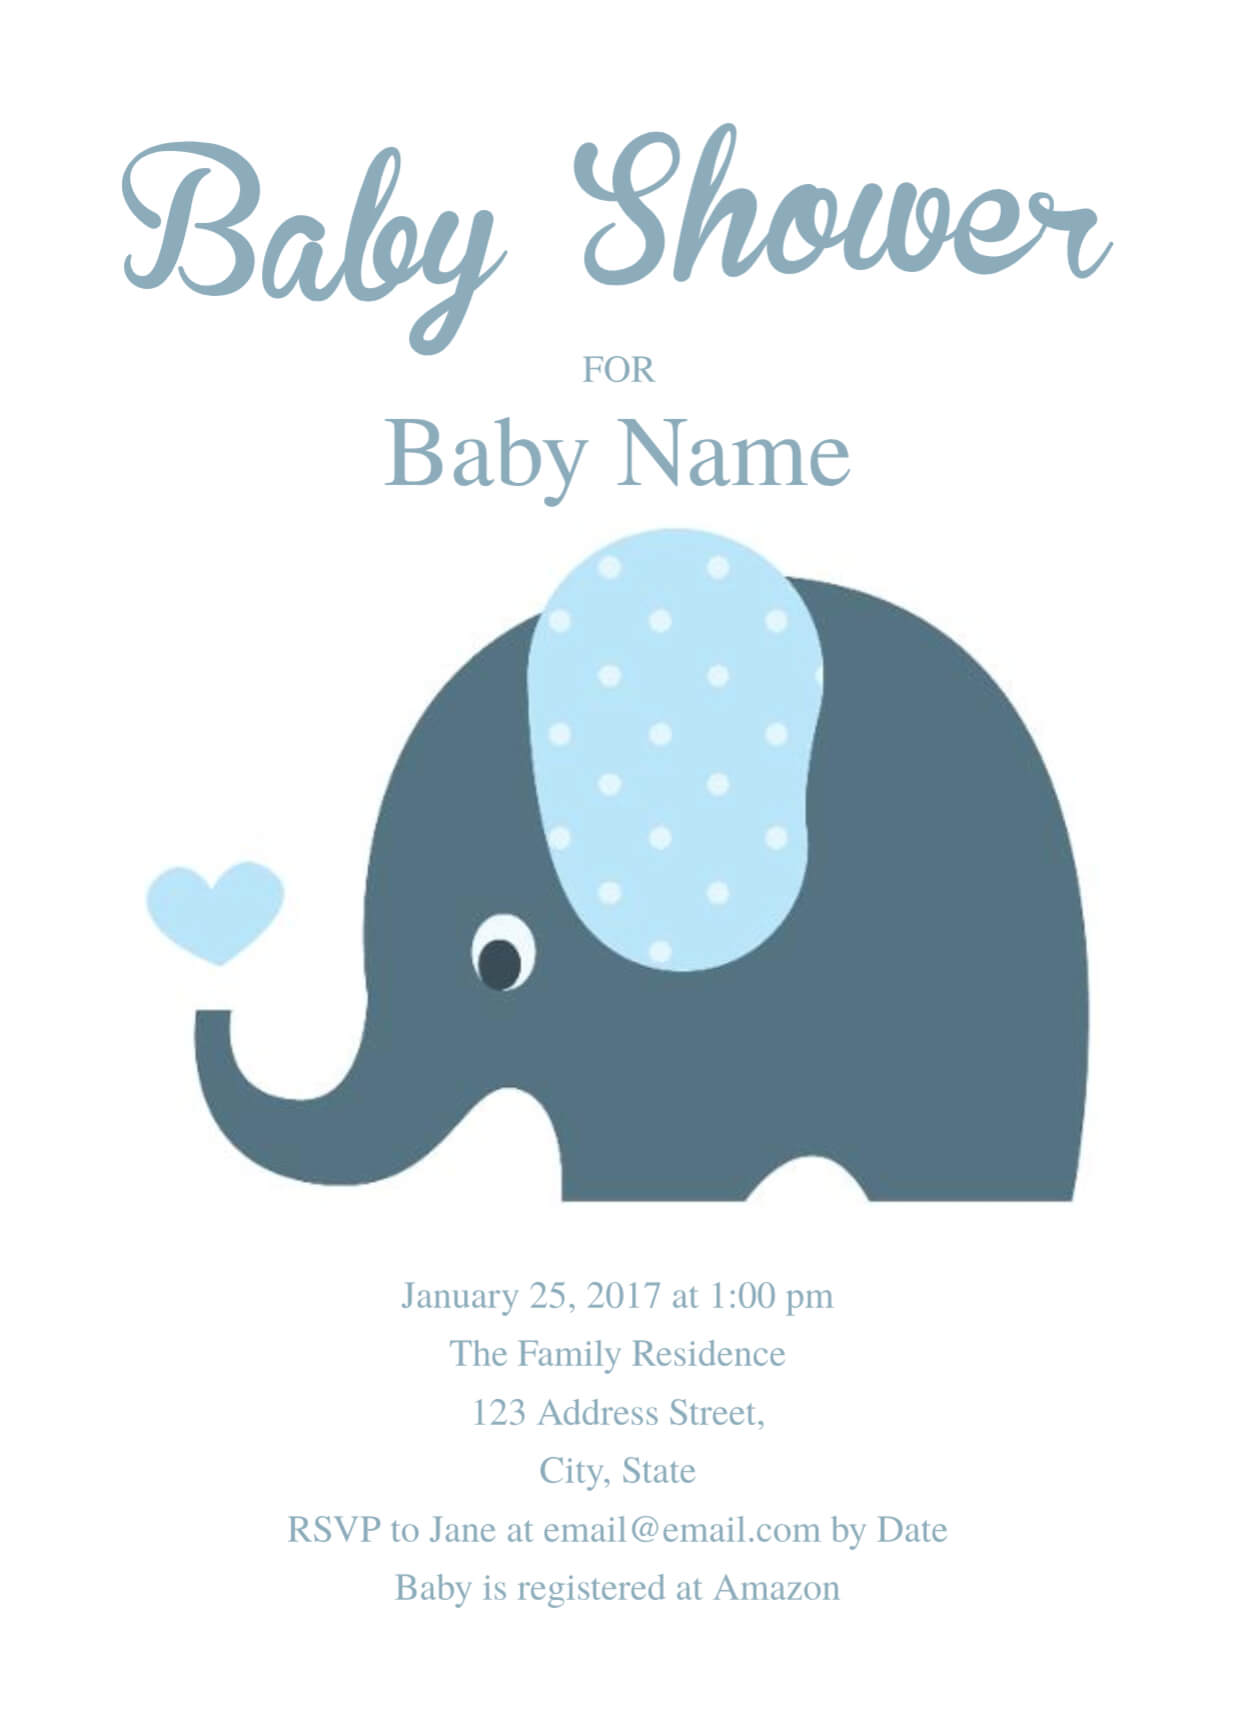 Cute Elephant Baby Shower Invitation Template | Free Baby Inside Free Baby Shower Invitation Templates Microsoft Word